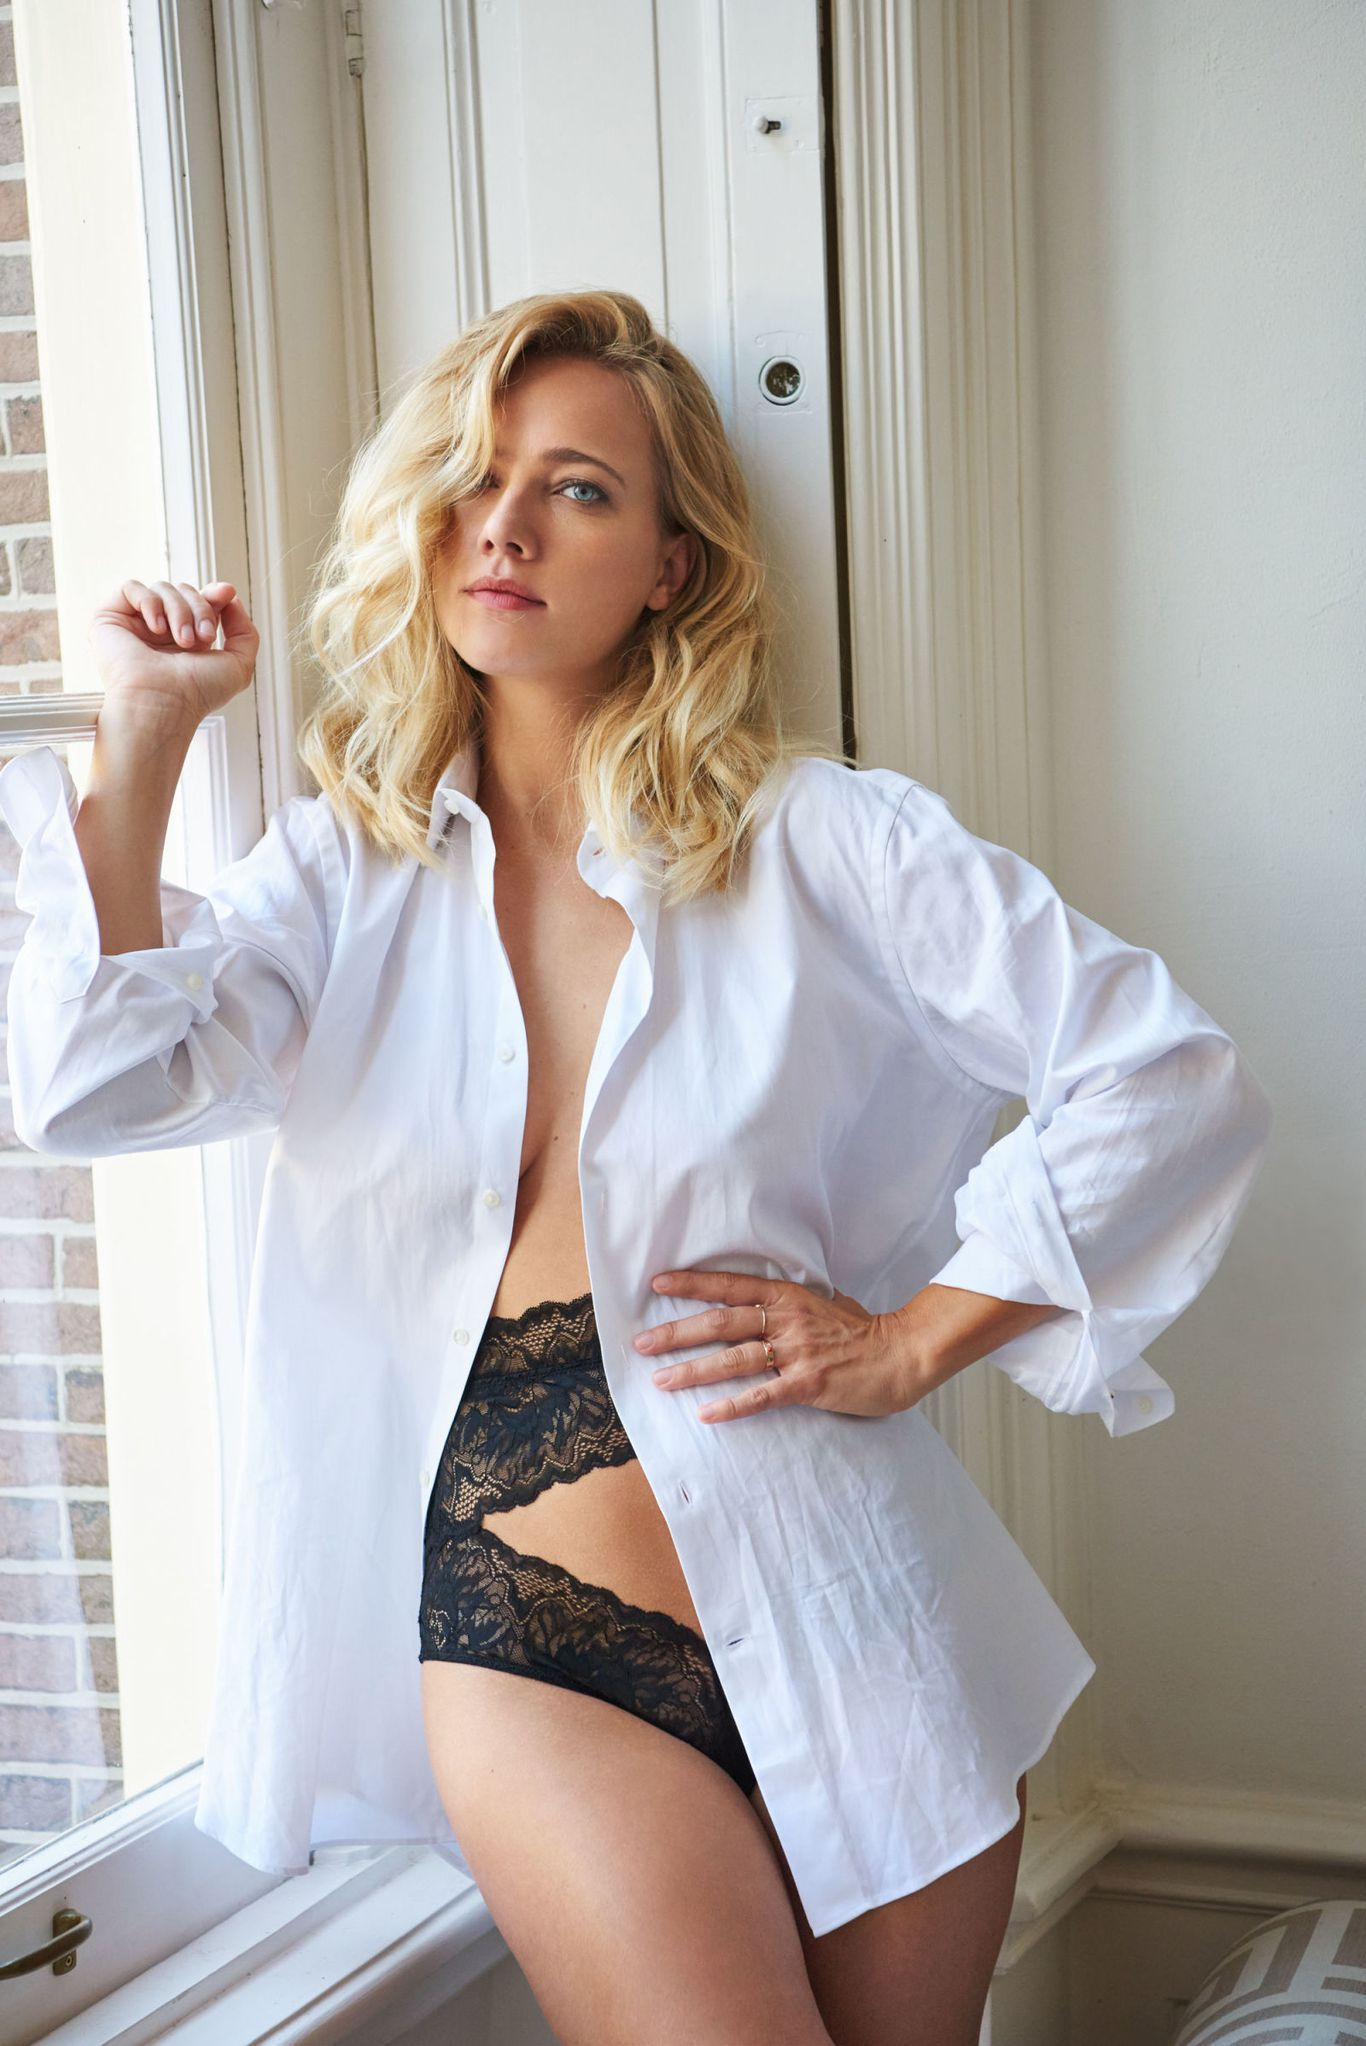 Erotica Naomi Nijboer nudes (19 foto and video), Sexy, Hot, Instagram, butt 2019